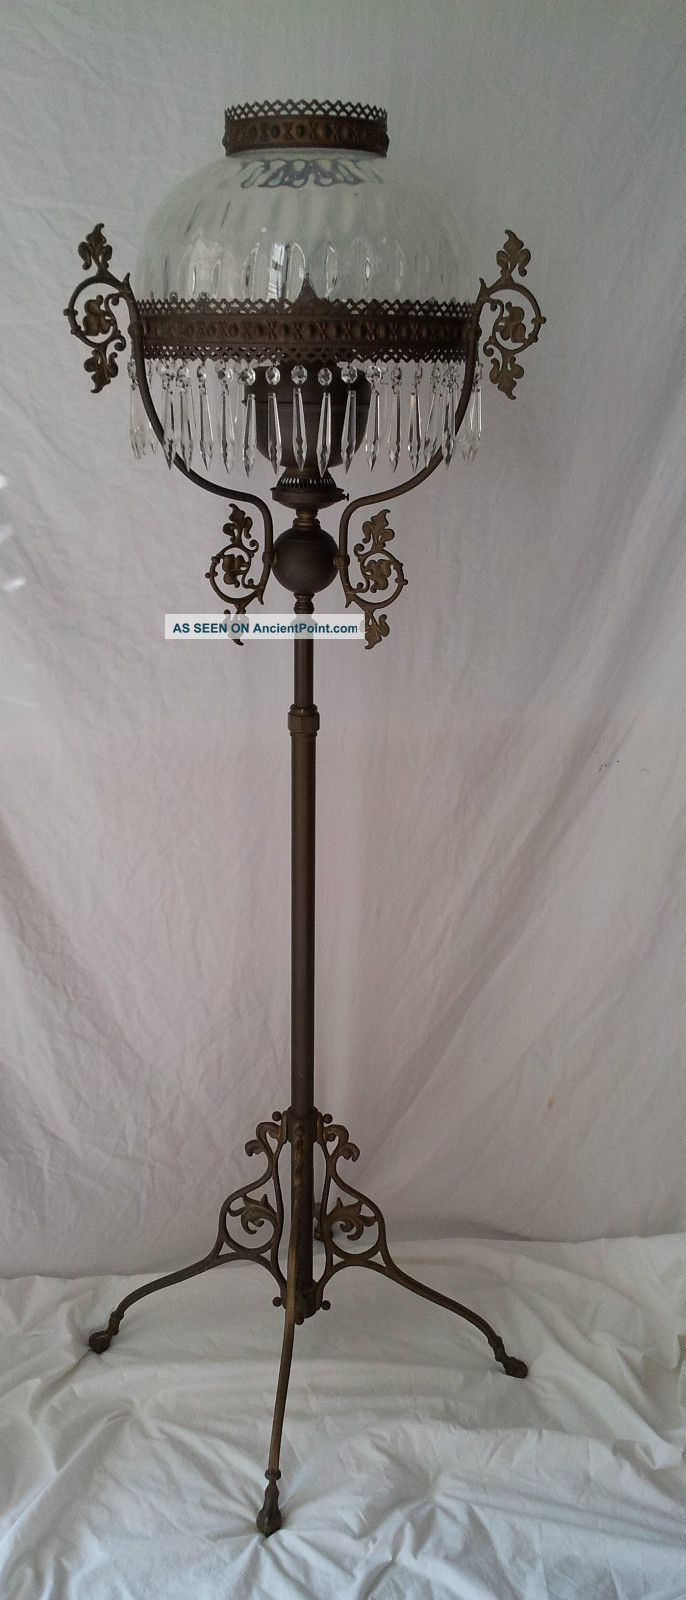 Victorian Style Floor Lamps Antique Victorian Style Kerosene Oil Floor Lamp Brass John Scott Made Antique Floor Lamps Antique Oil Lamps Victorian Lamps